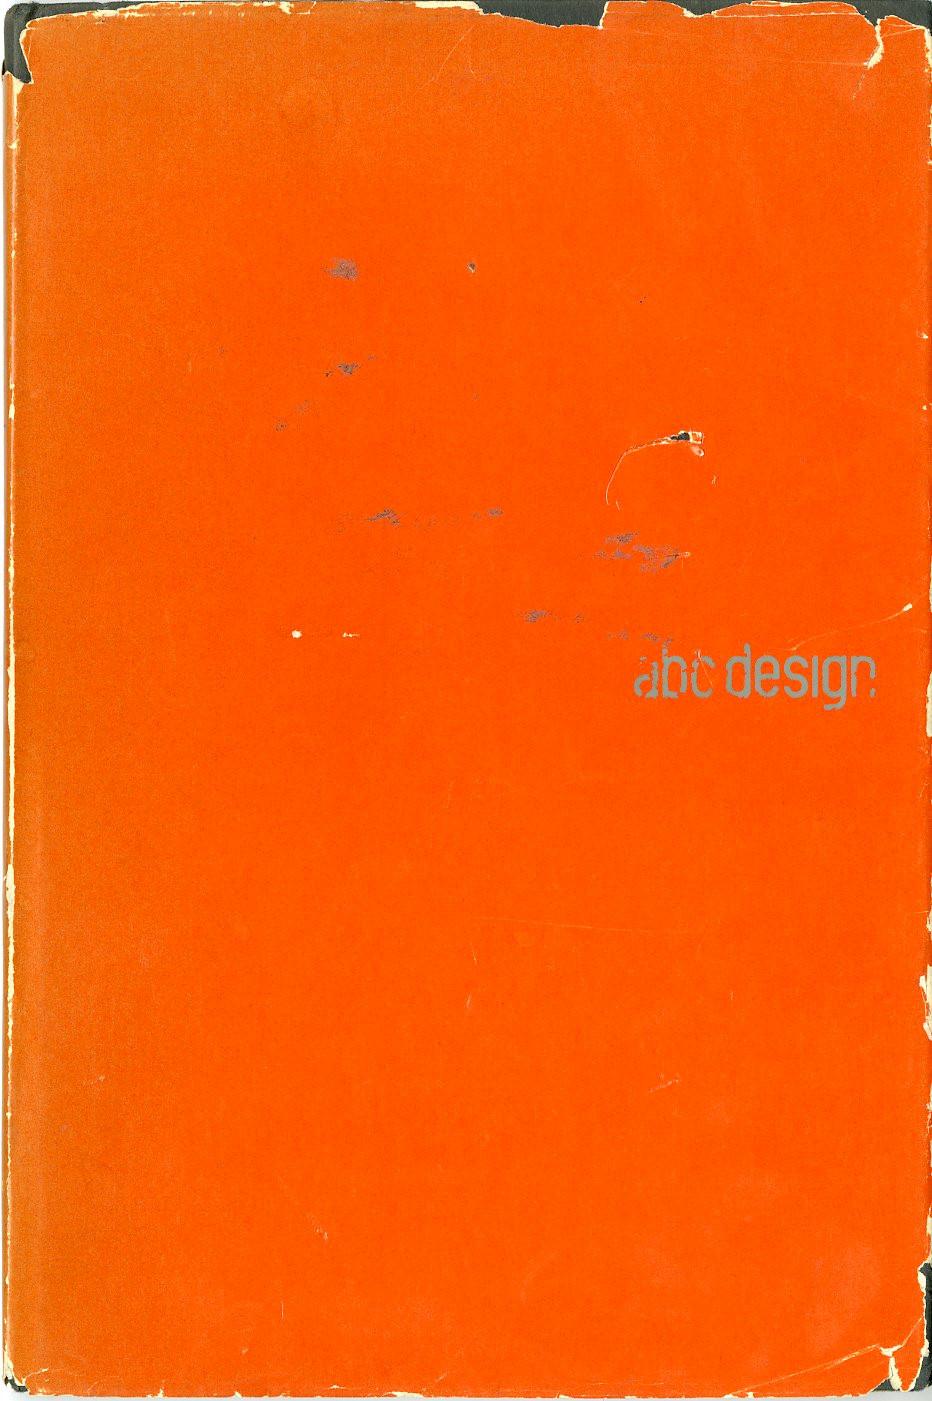 ABS design